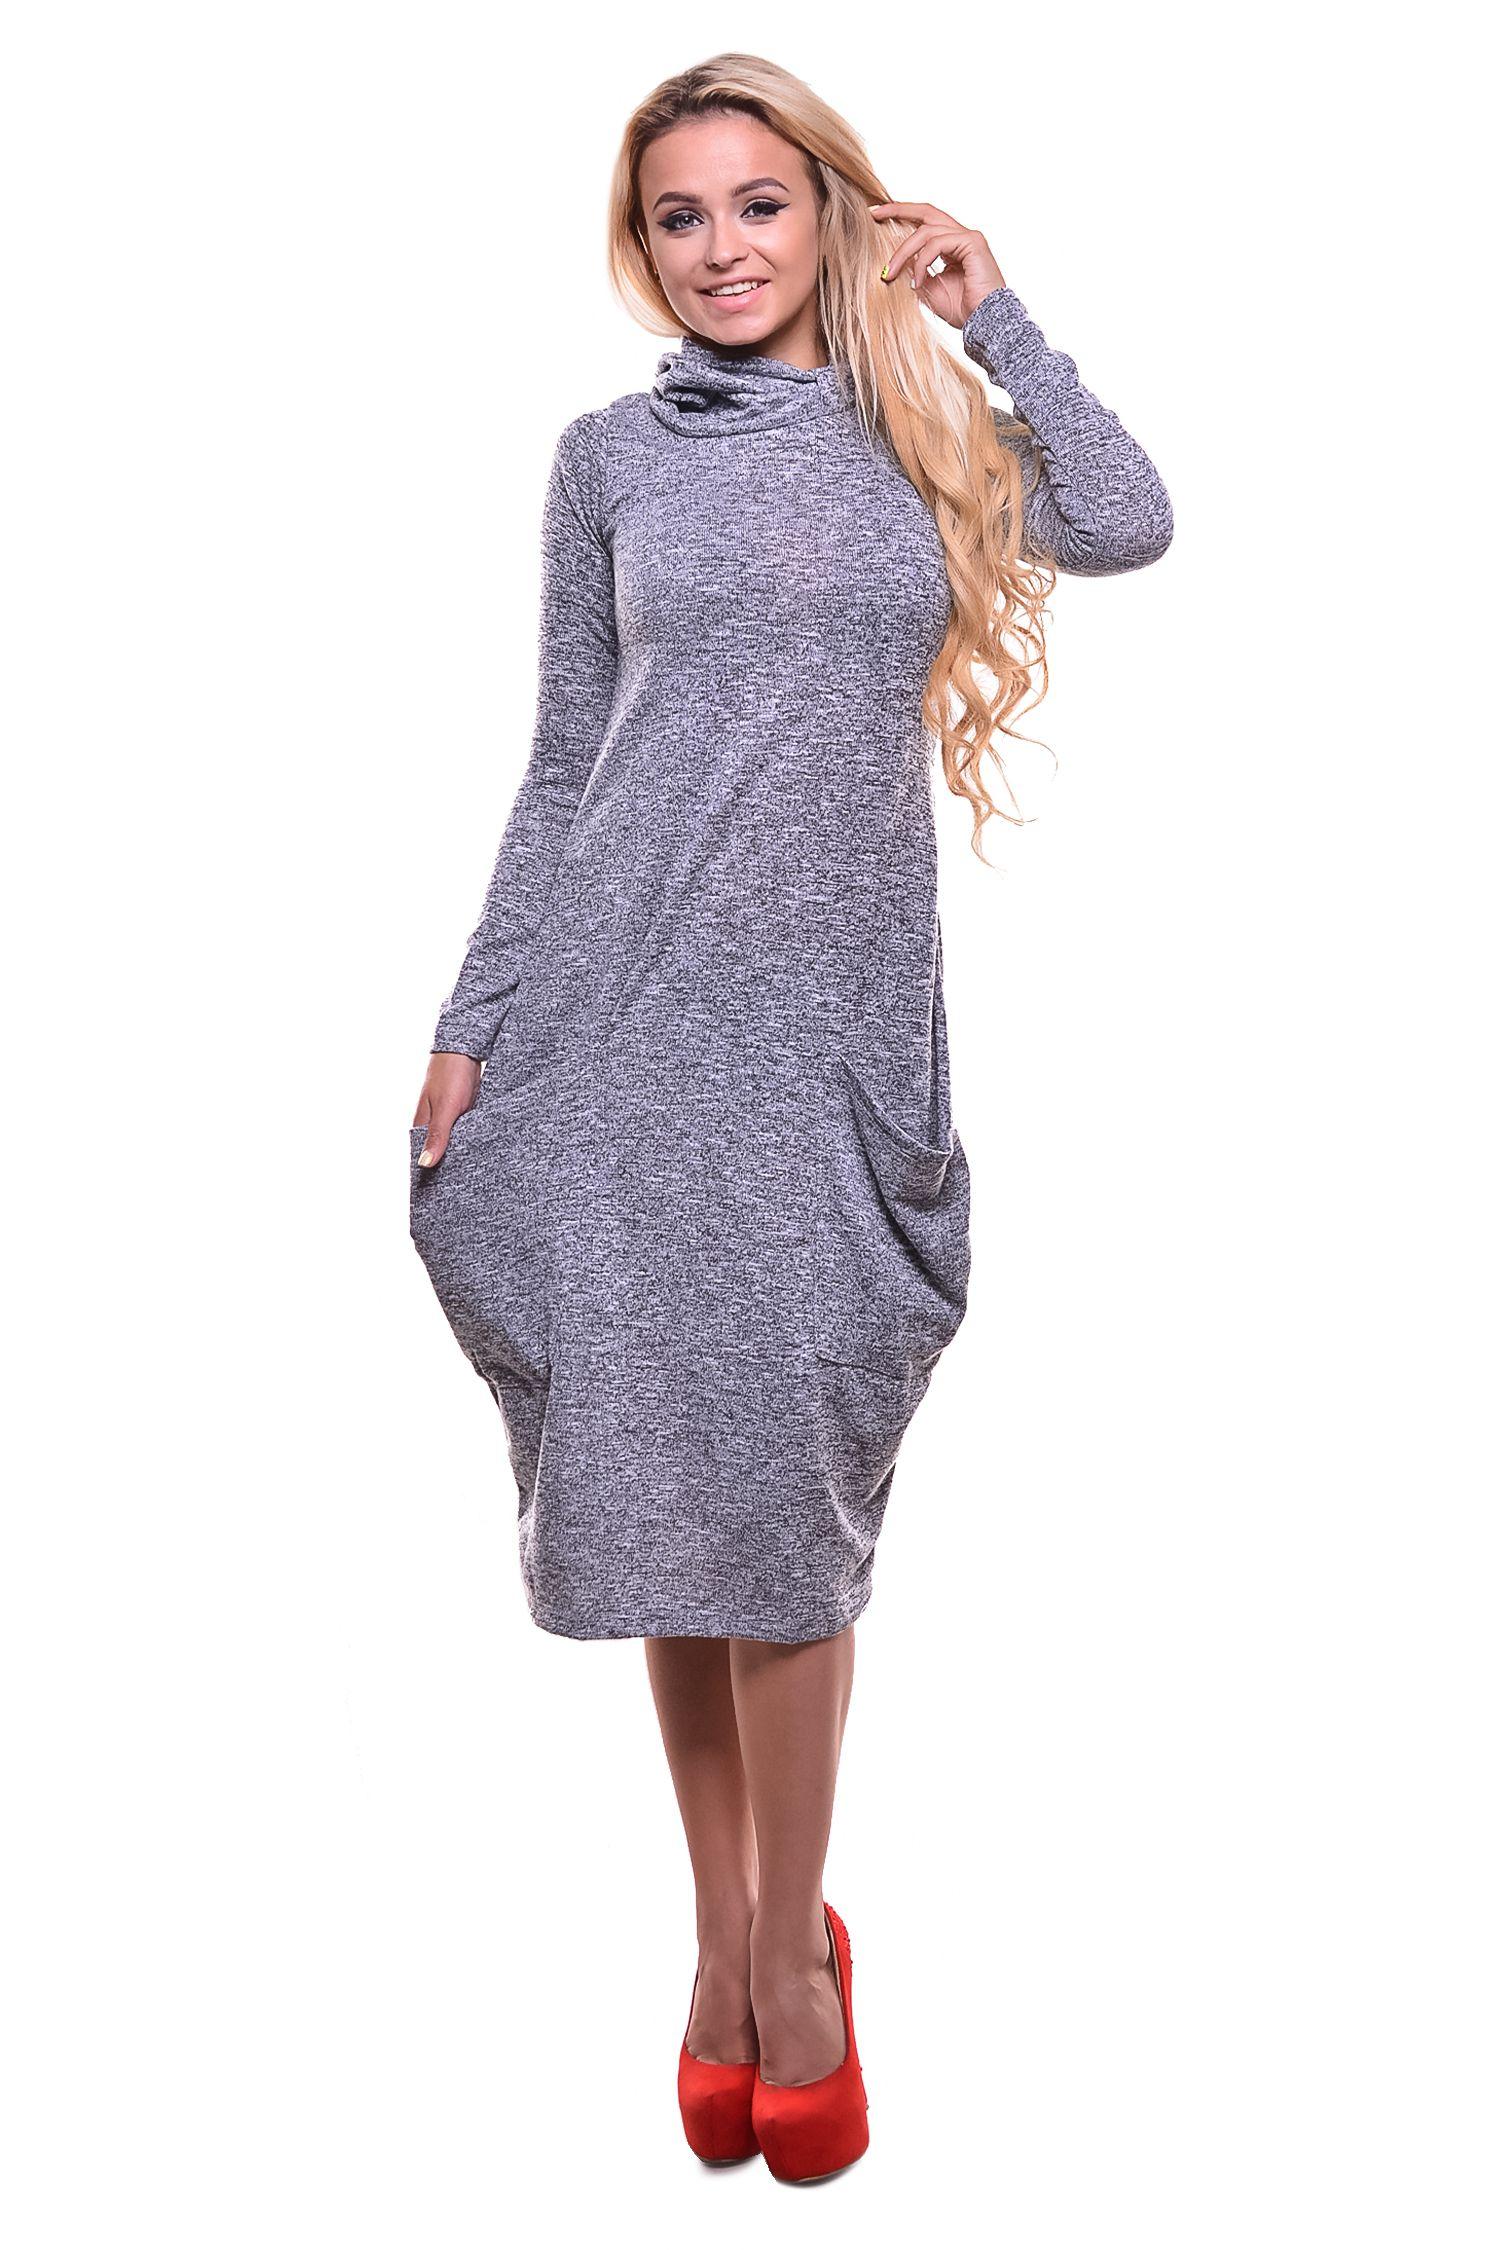 a97ea71212a2caf Платье-бочонок с кармашками Состав ткани: 90% хлопок 10% эластан. Платье